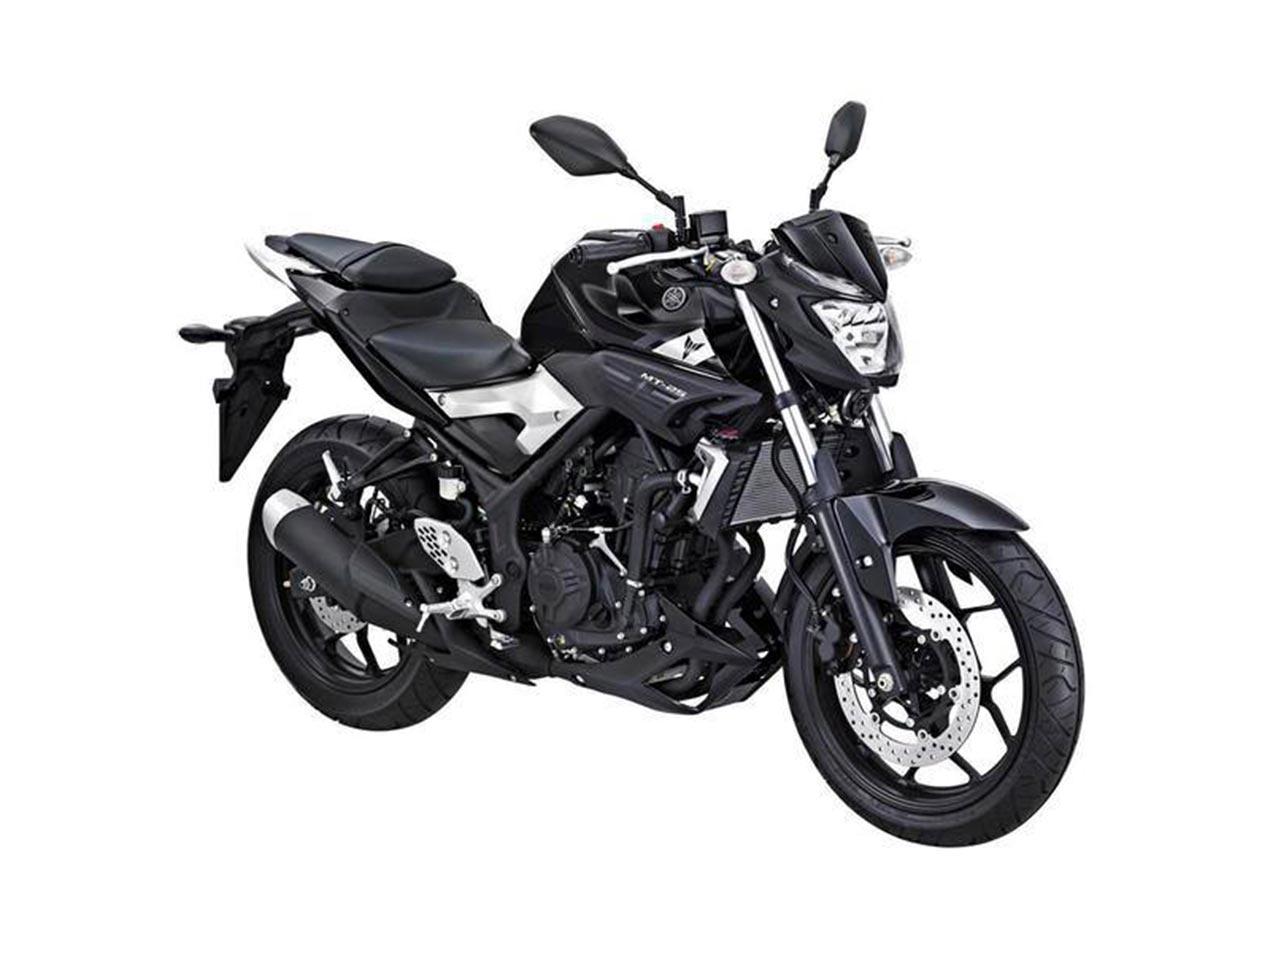 Yamaha mt 25 debuts in indonesia asphalt rubber for Yamaha 221 vs 222